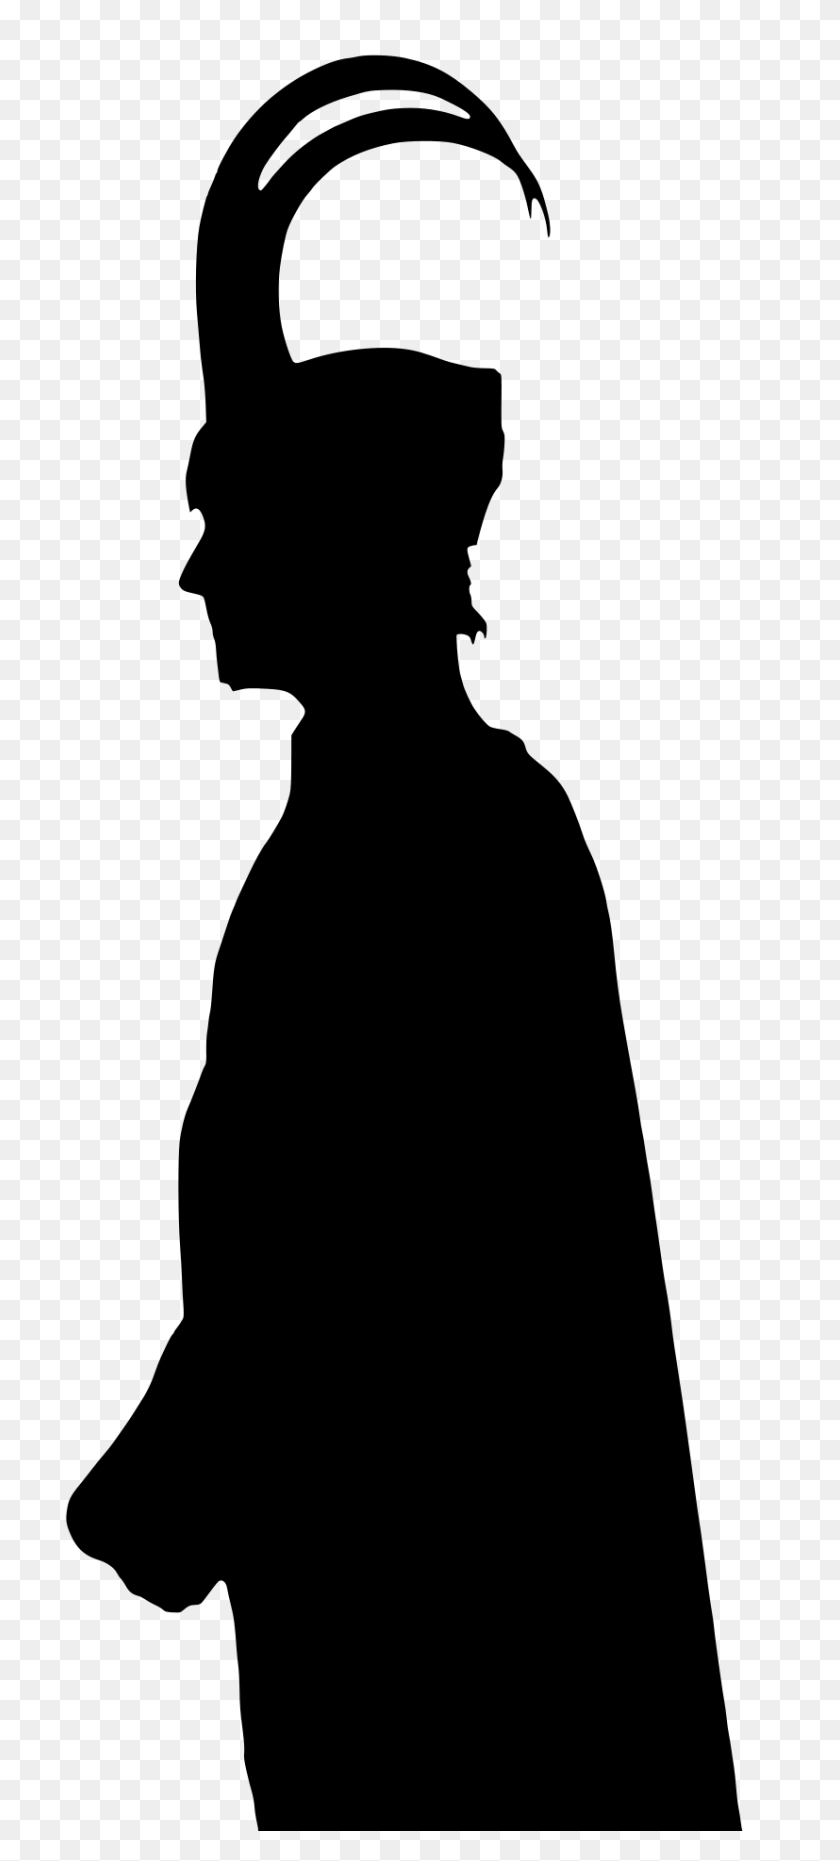 827x1910 Loki's Vectorized Silhouette - Loki Clip Art